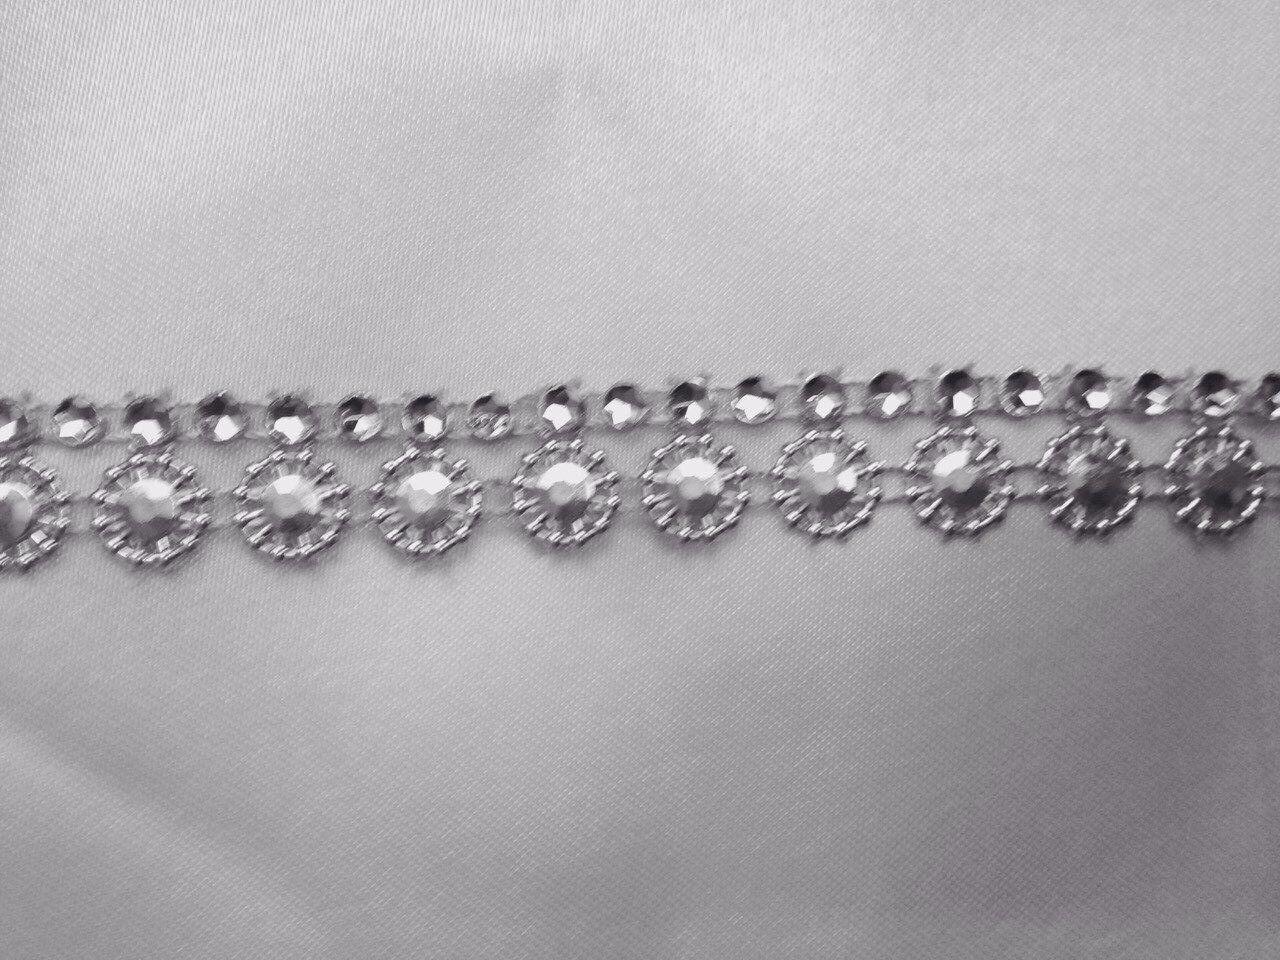 STUD Sunflower Silver DIAMANTE EFFECT RIBBON TRIM,WEDDING,Decorate,CRAFT,15mm